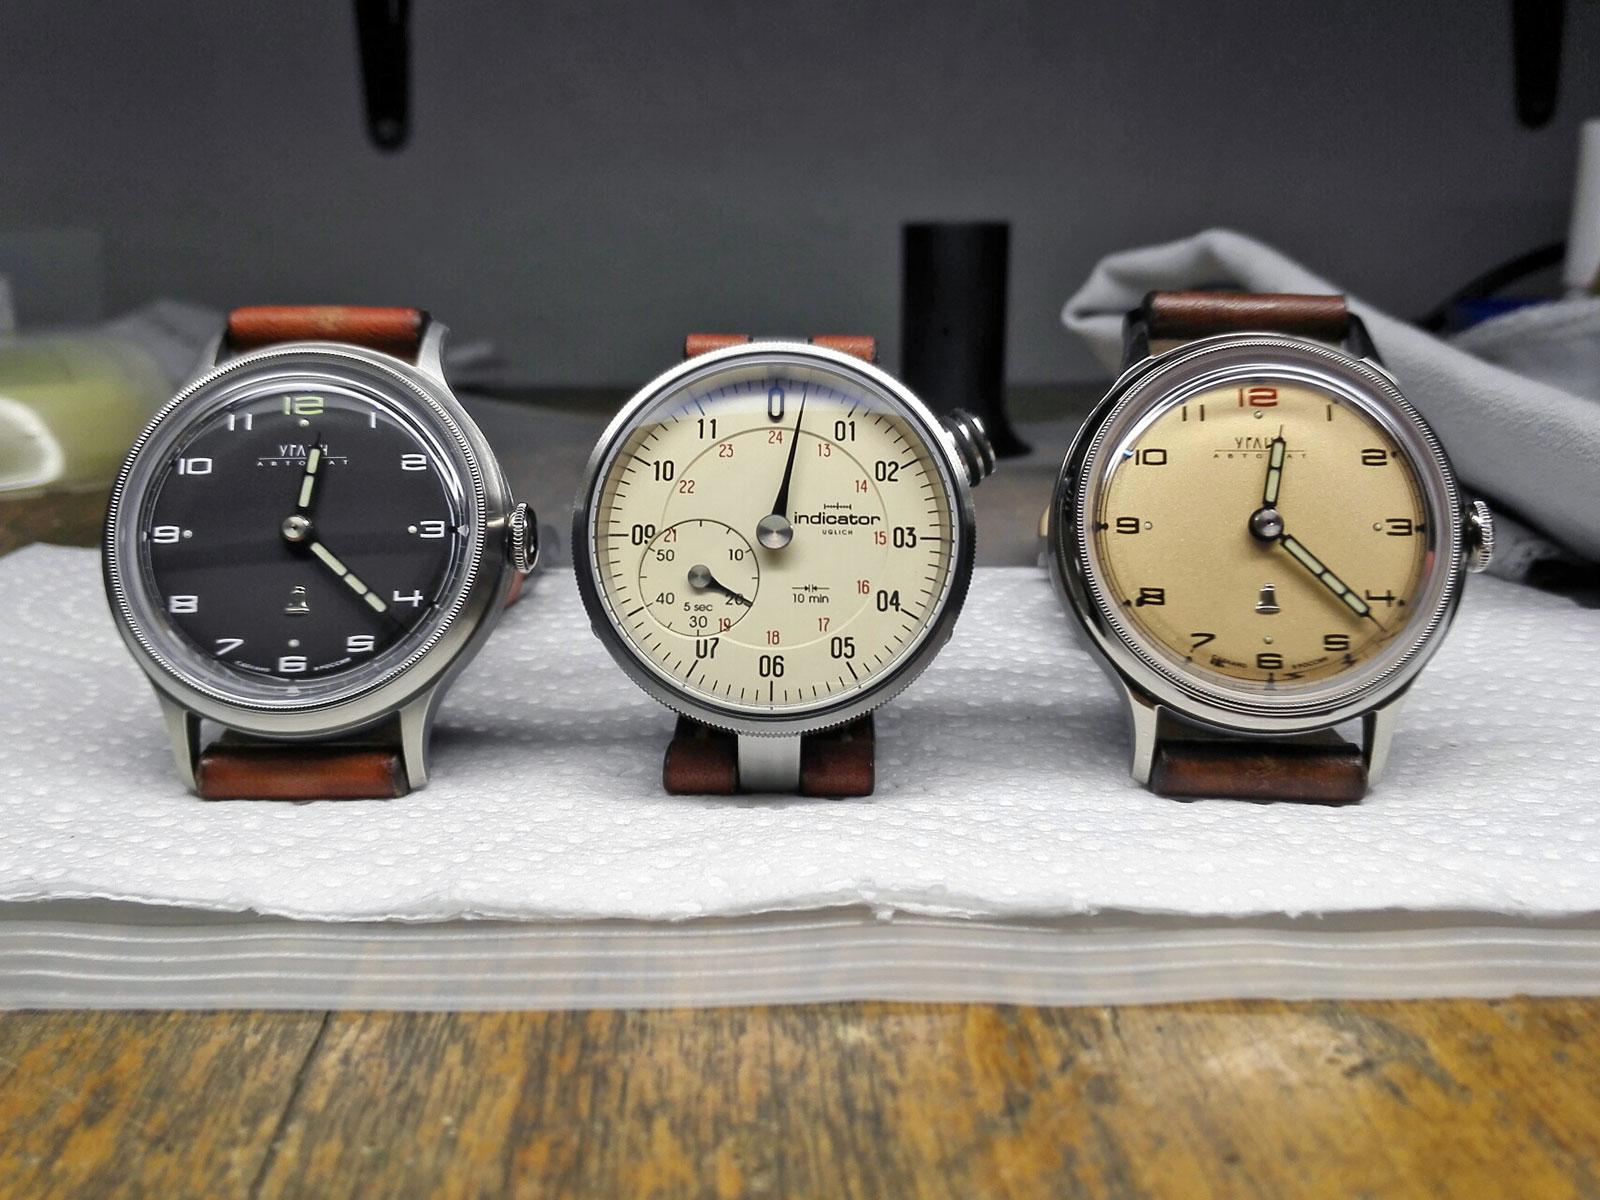 Colibrica design Inidcator watch 2